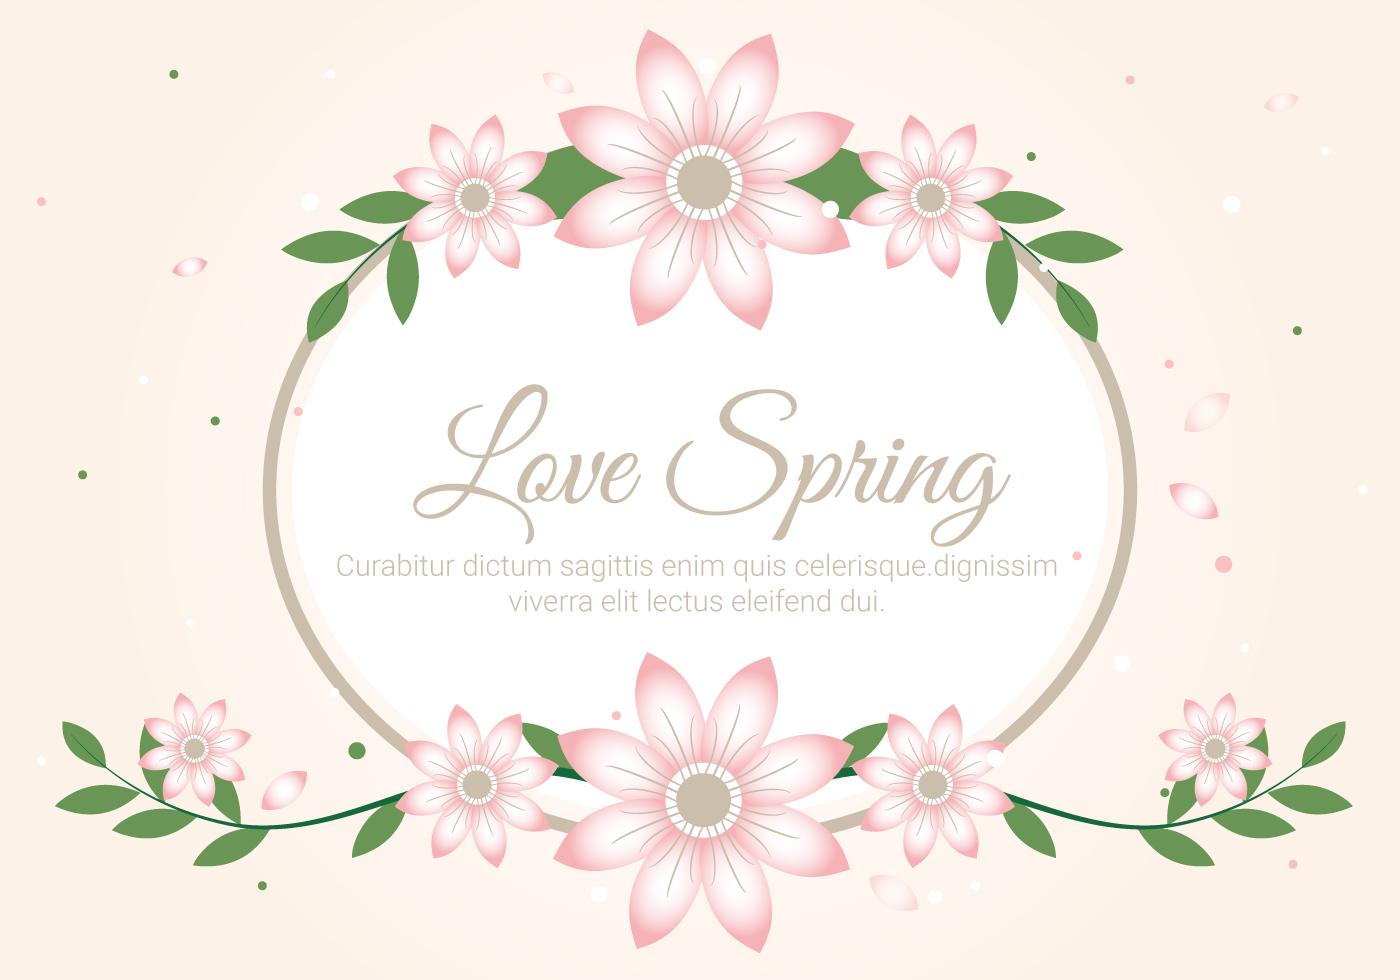 free spring season decoration vector background